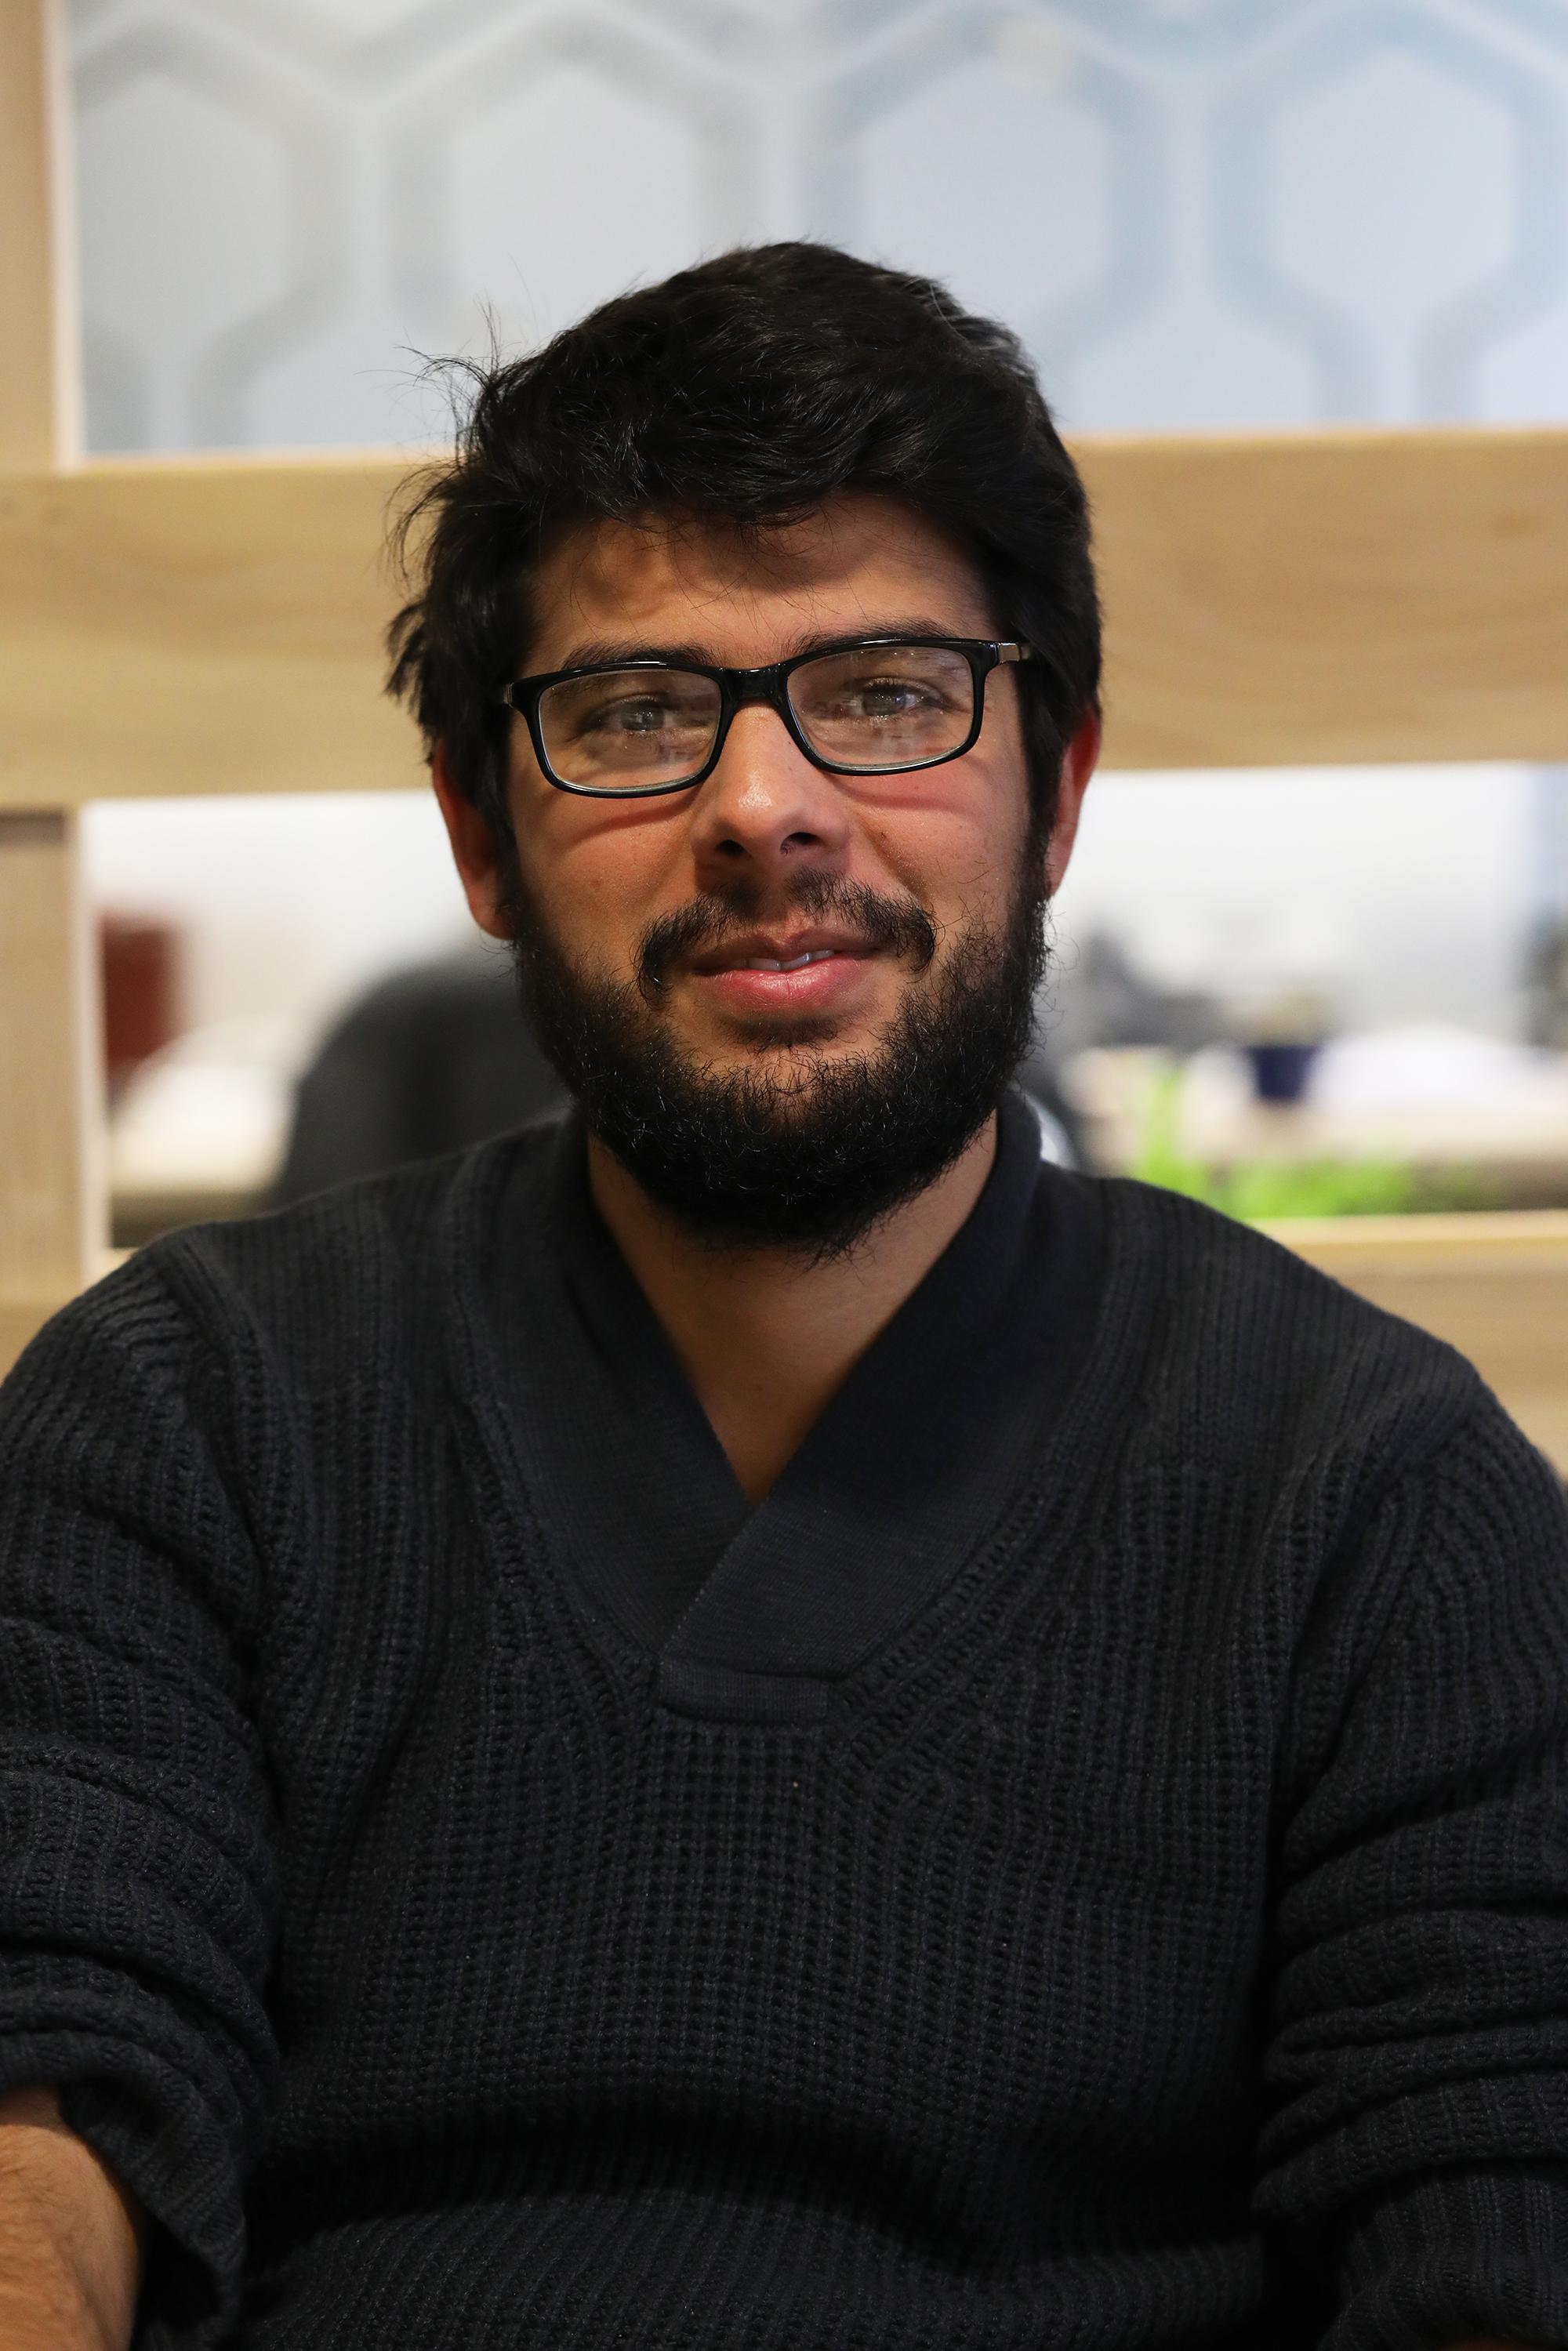 Mourad Bennis